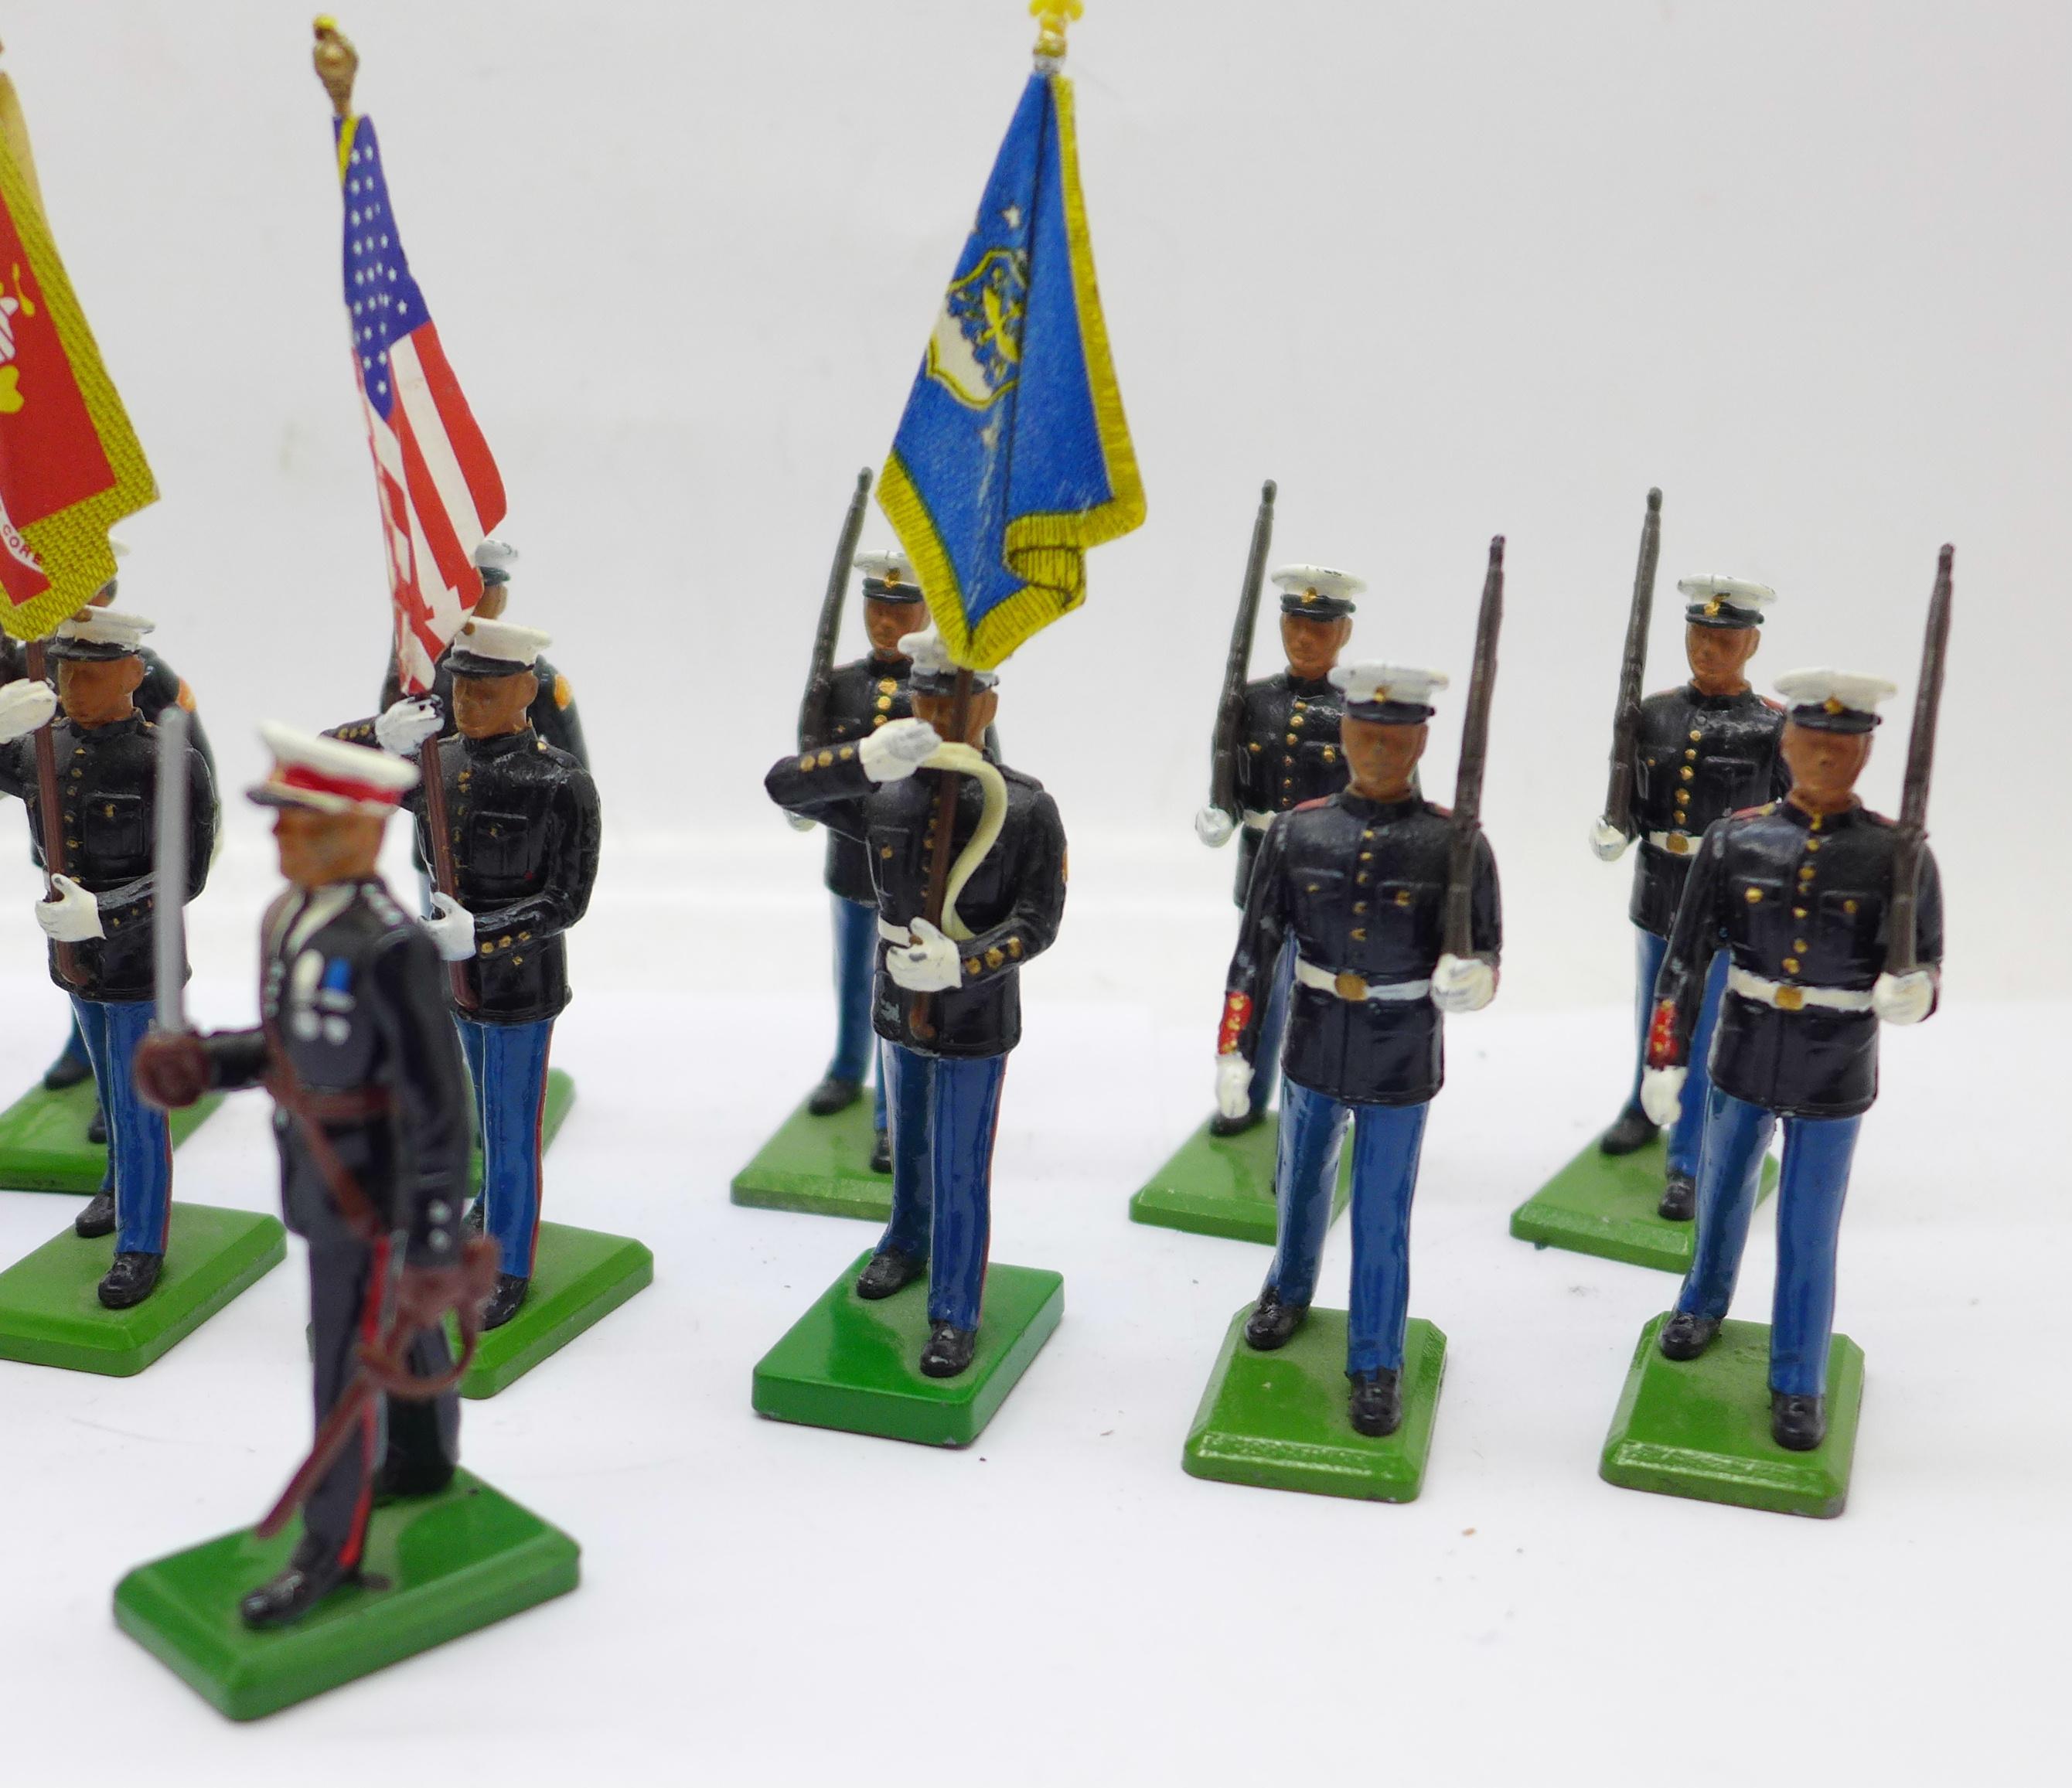 Twenty 1986 Britains Toys marching U.S. Marine figures - Image 3 of 5